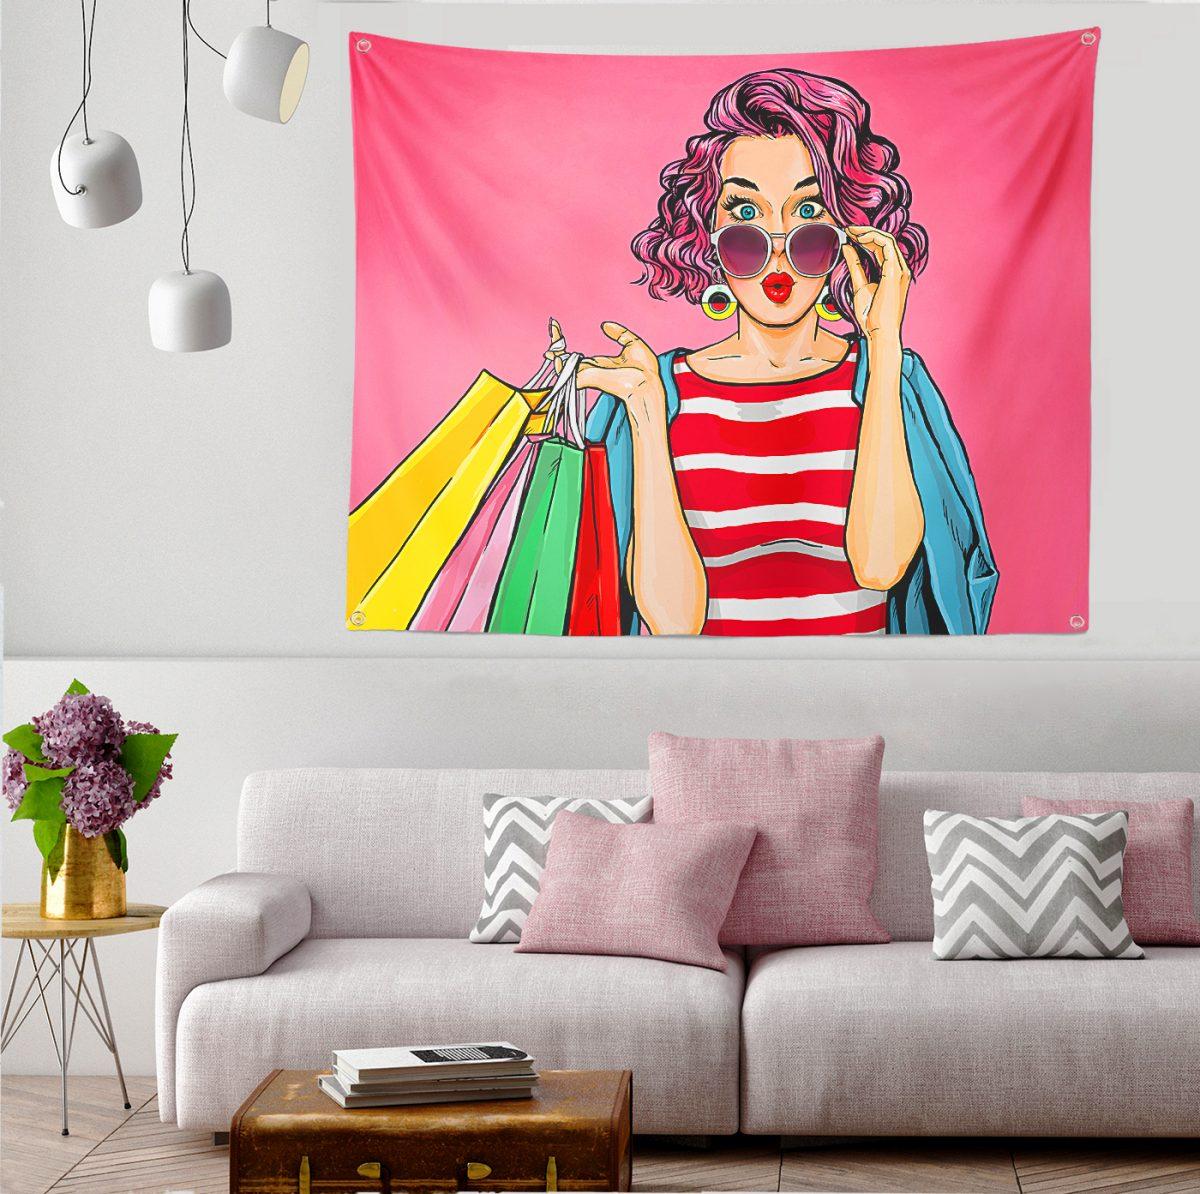 Pembe Zeminli Popart Desenli Tapestry Duvar Örtüsü Realhomes